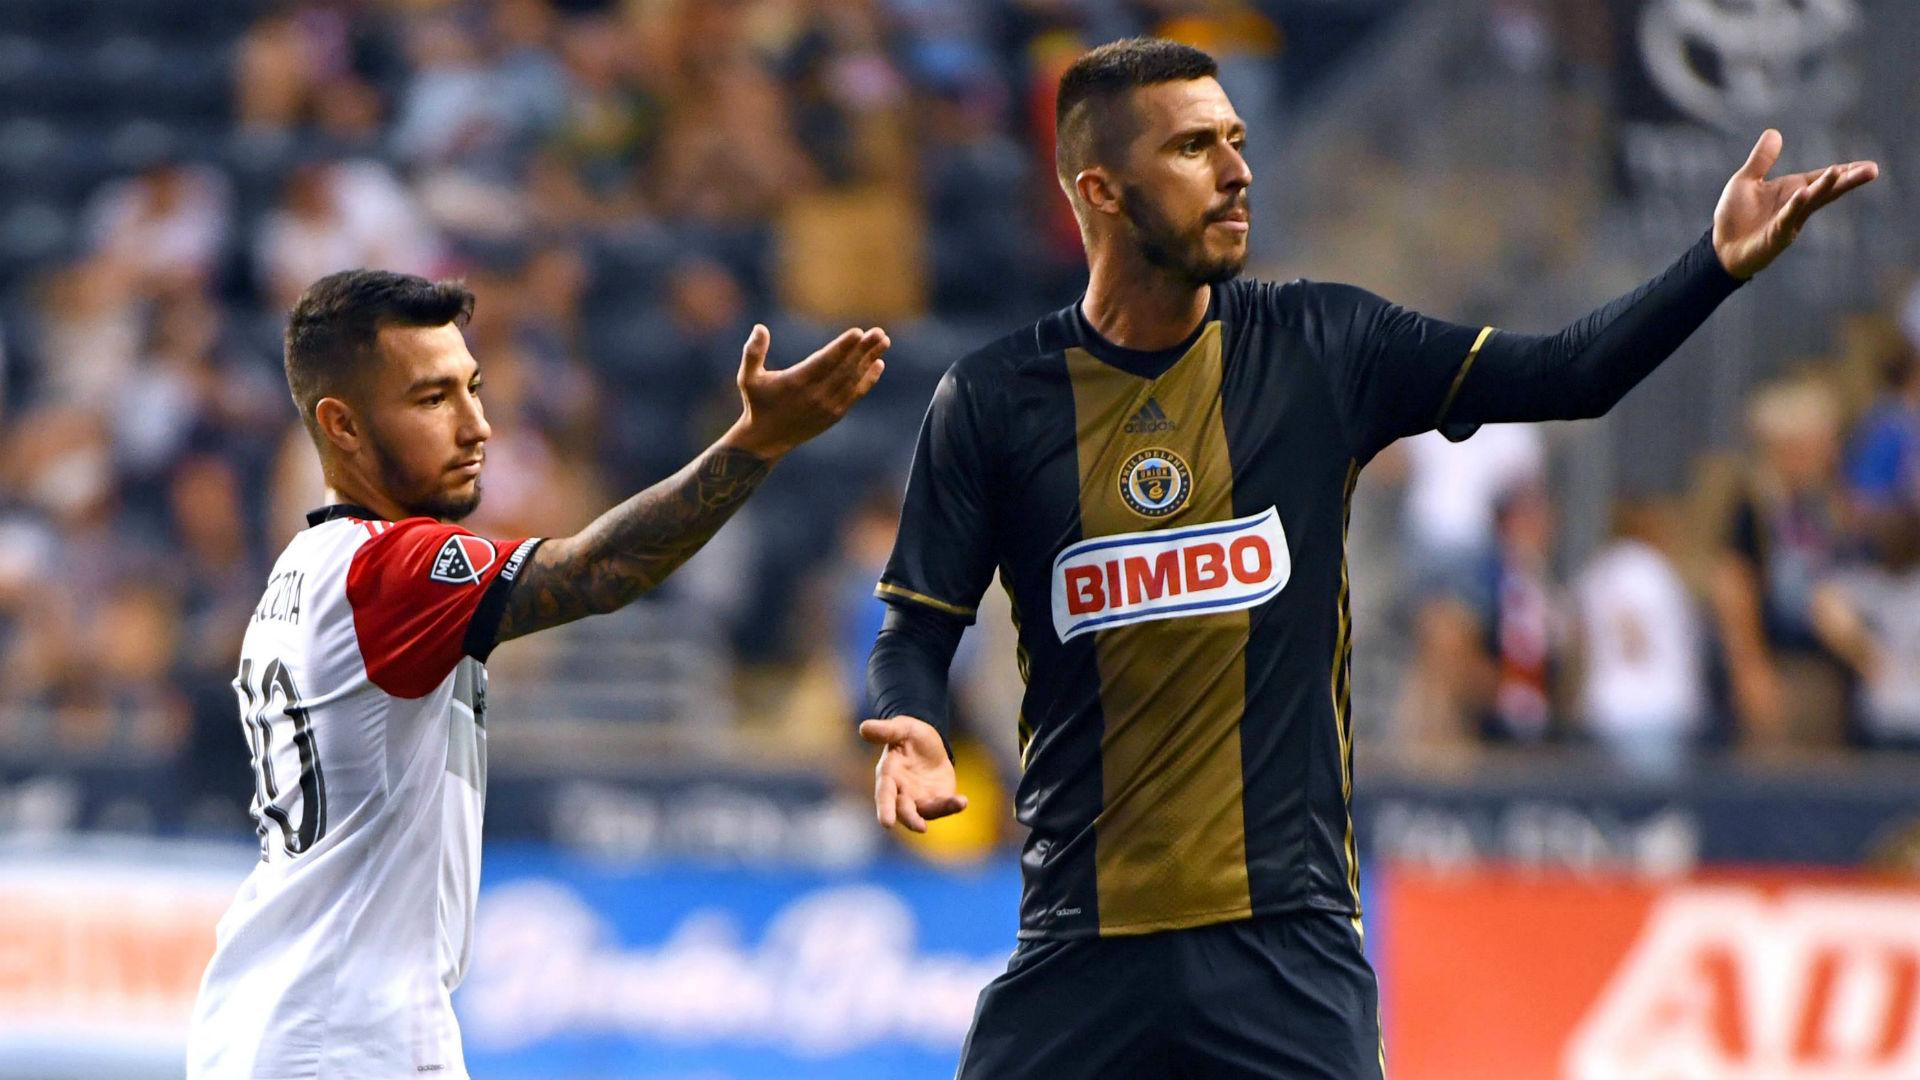 Luciano Acosta Haris Medunjanin DC United Philadelphia Union MLS 062417.